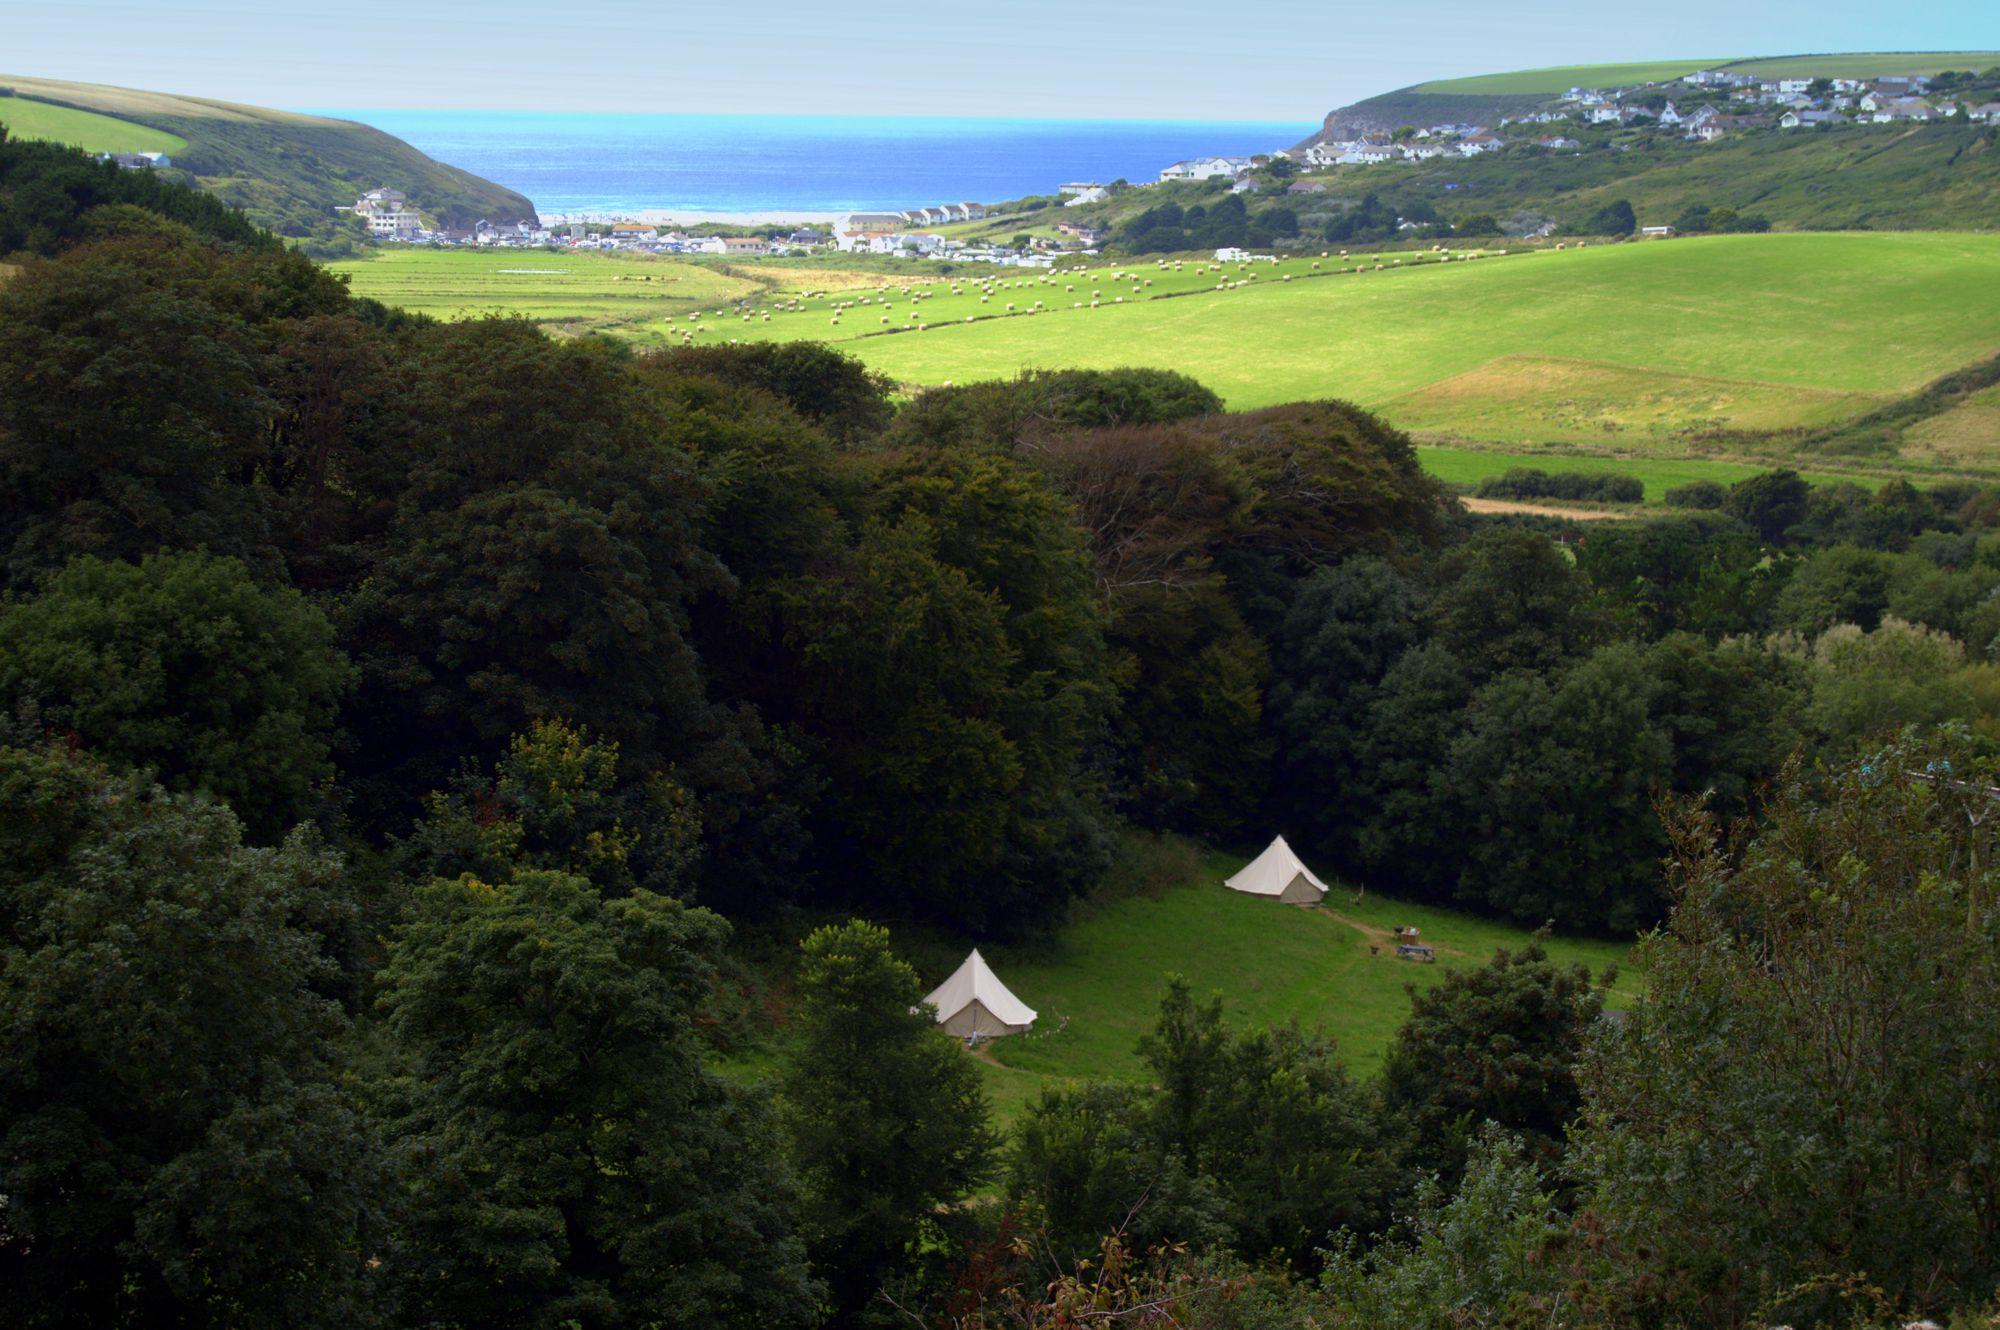 A wonderful rural location near the sea.